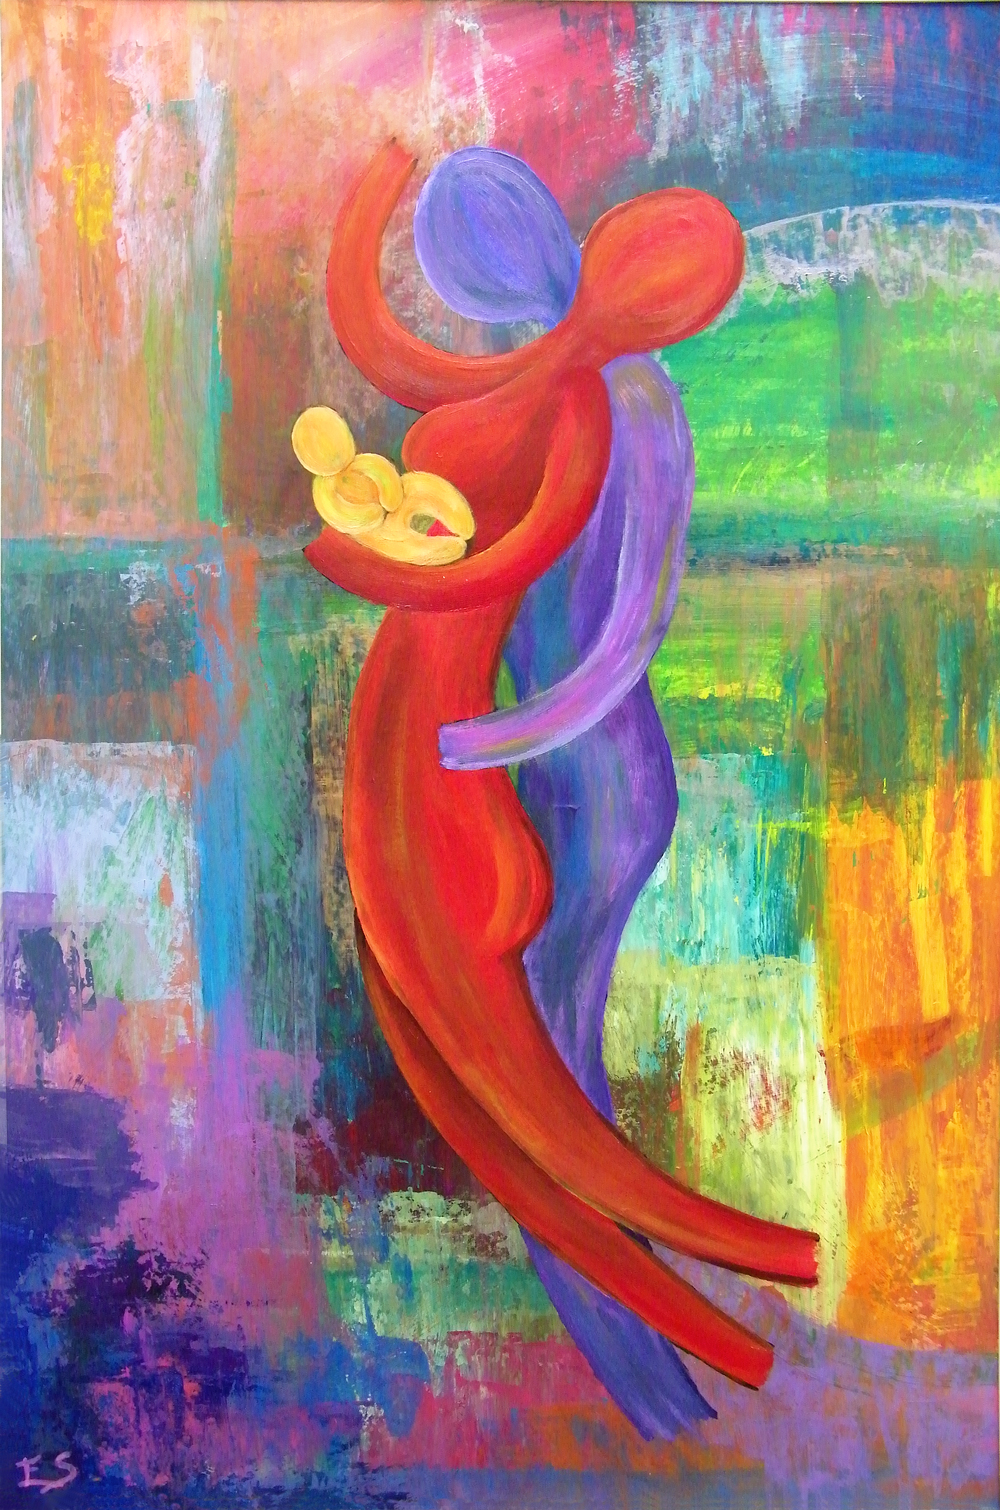 Intuïtief schilderij - samen één